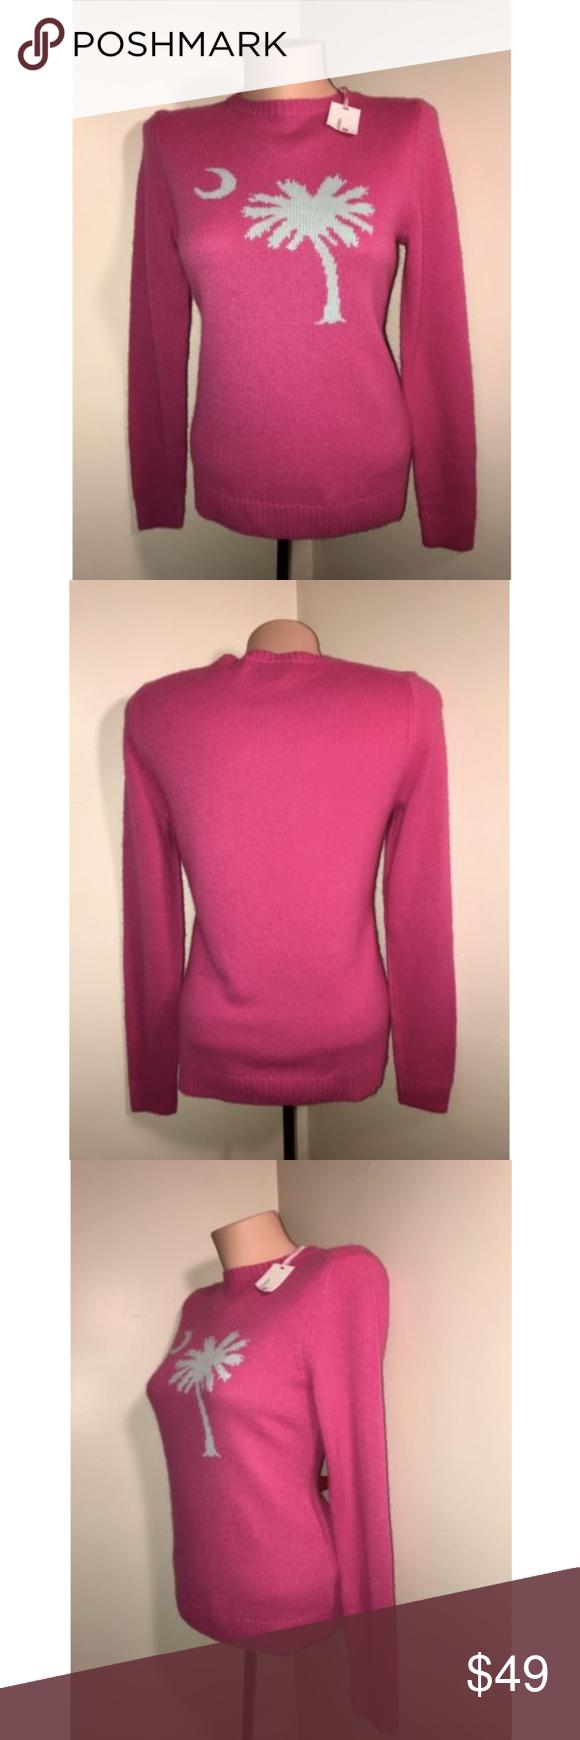 Vineyard Vines Women's Pink Cashmere Sweater Size: 2XS (XXS) Color ...